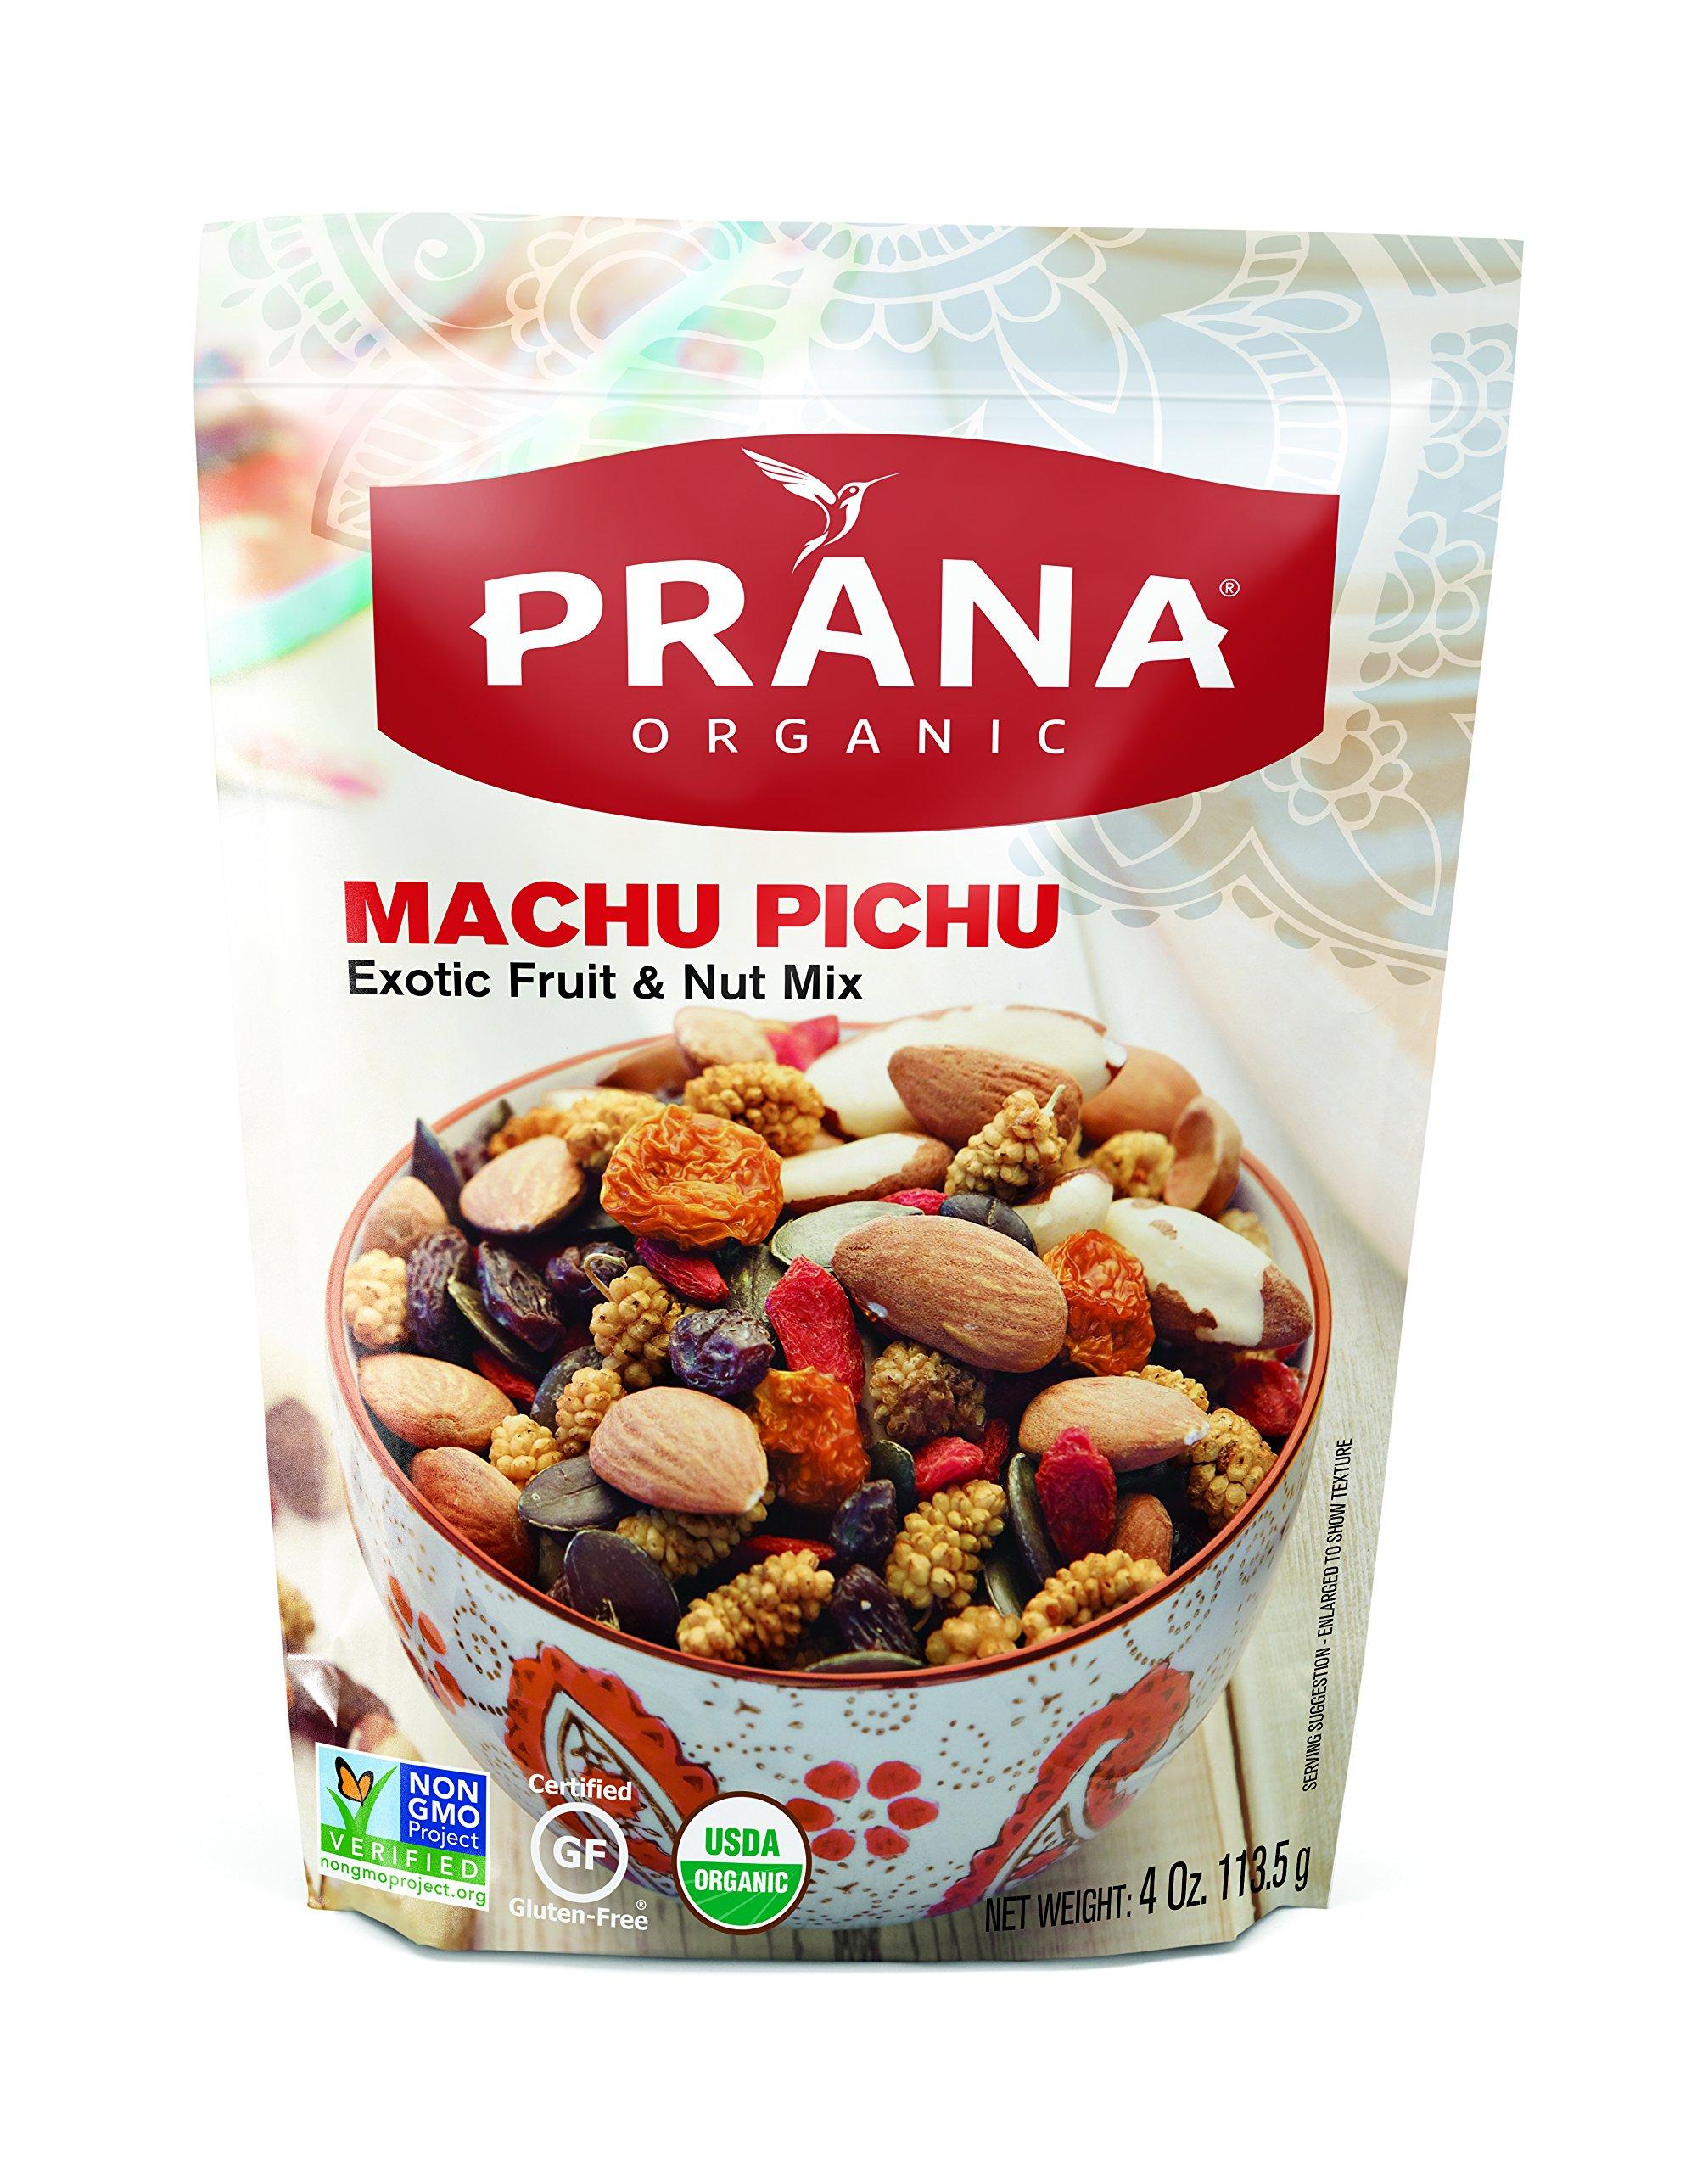 PRANA MACHU PICHU - Organic Nuts & Fruit Mix, 8 x 4oz